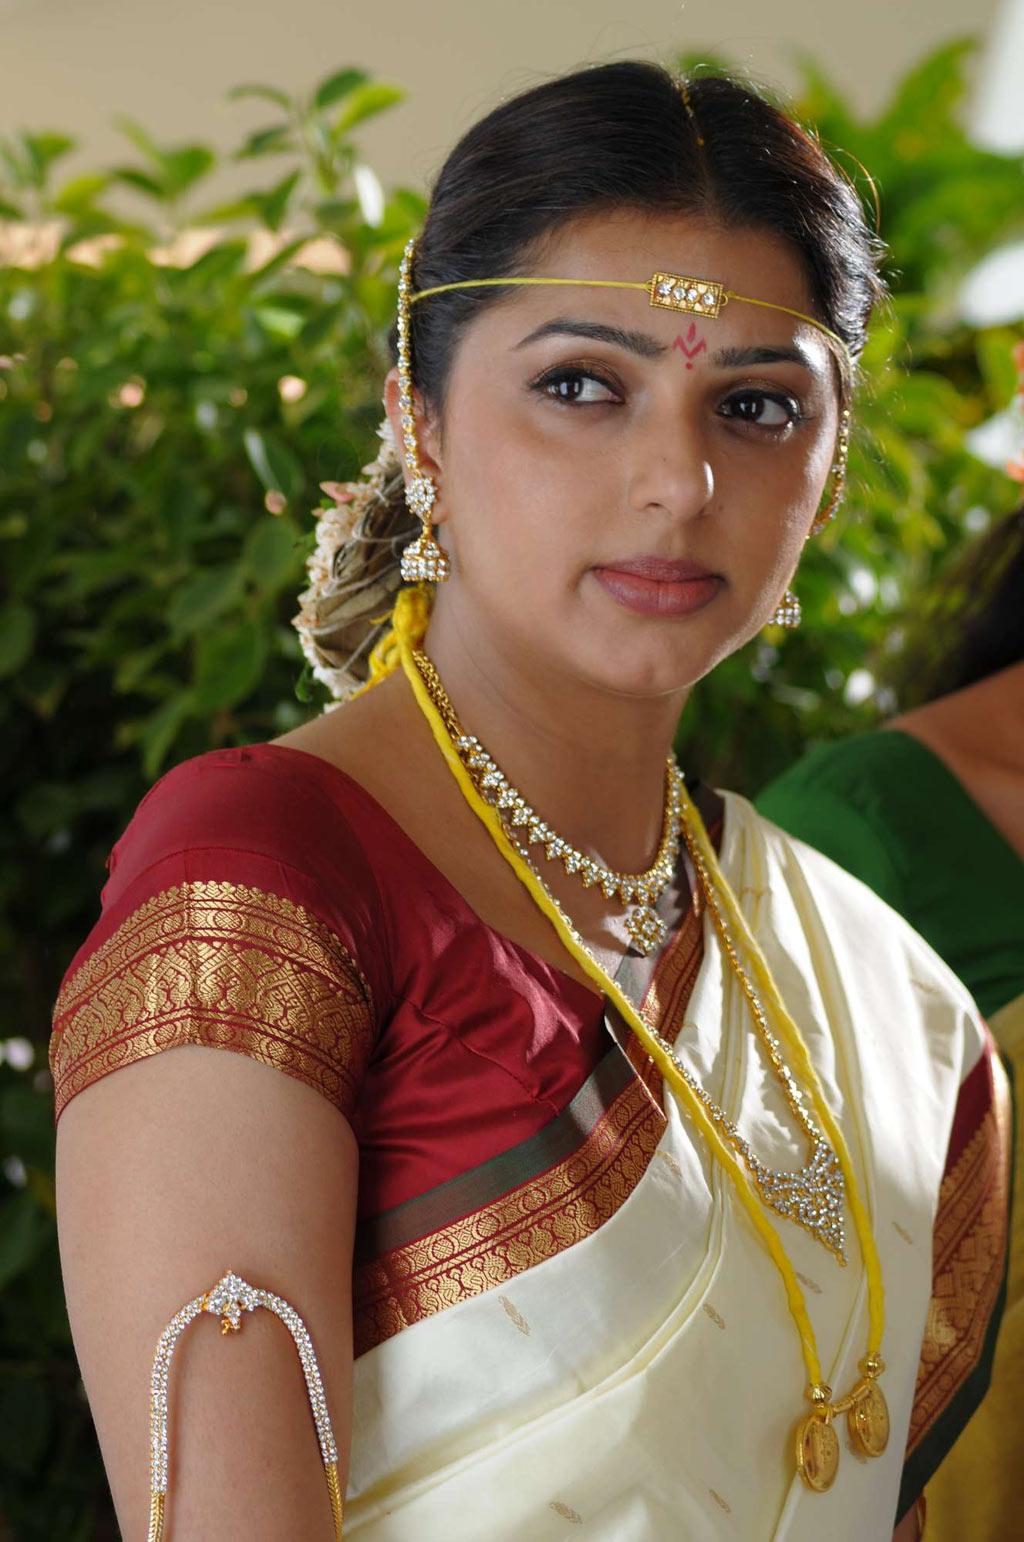 Hansika Motwani Cute Wallpapers Bhumika Chawla In Saree Photo Gallery Actress Photosz